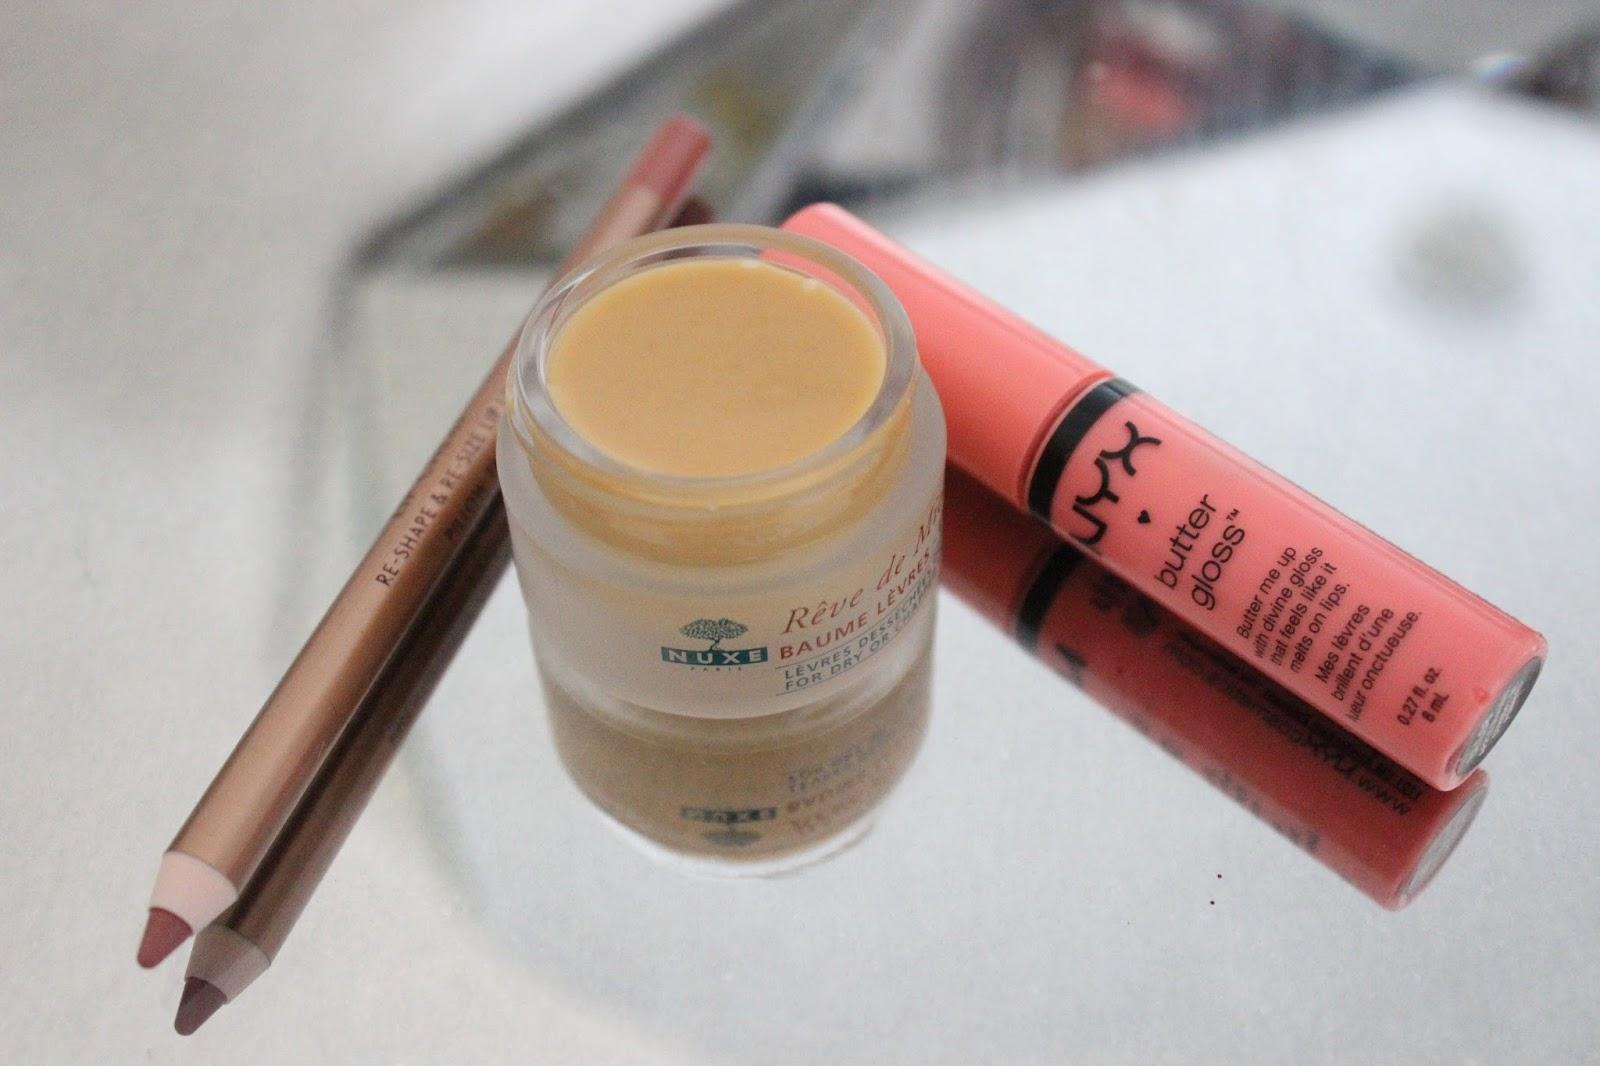 14 Top Beauty Favourites of 2014 - Charlotte Tilbury Lip Cheat in Pillow Talk, Nuxe Reve de Miel Lip BAlm, NYX Butter Gloss